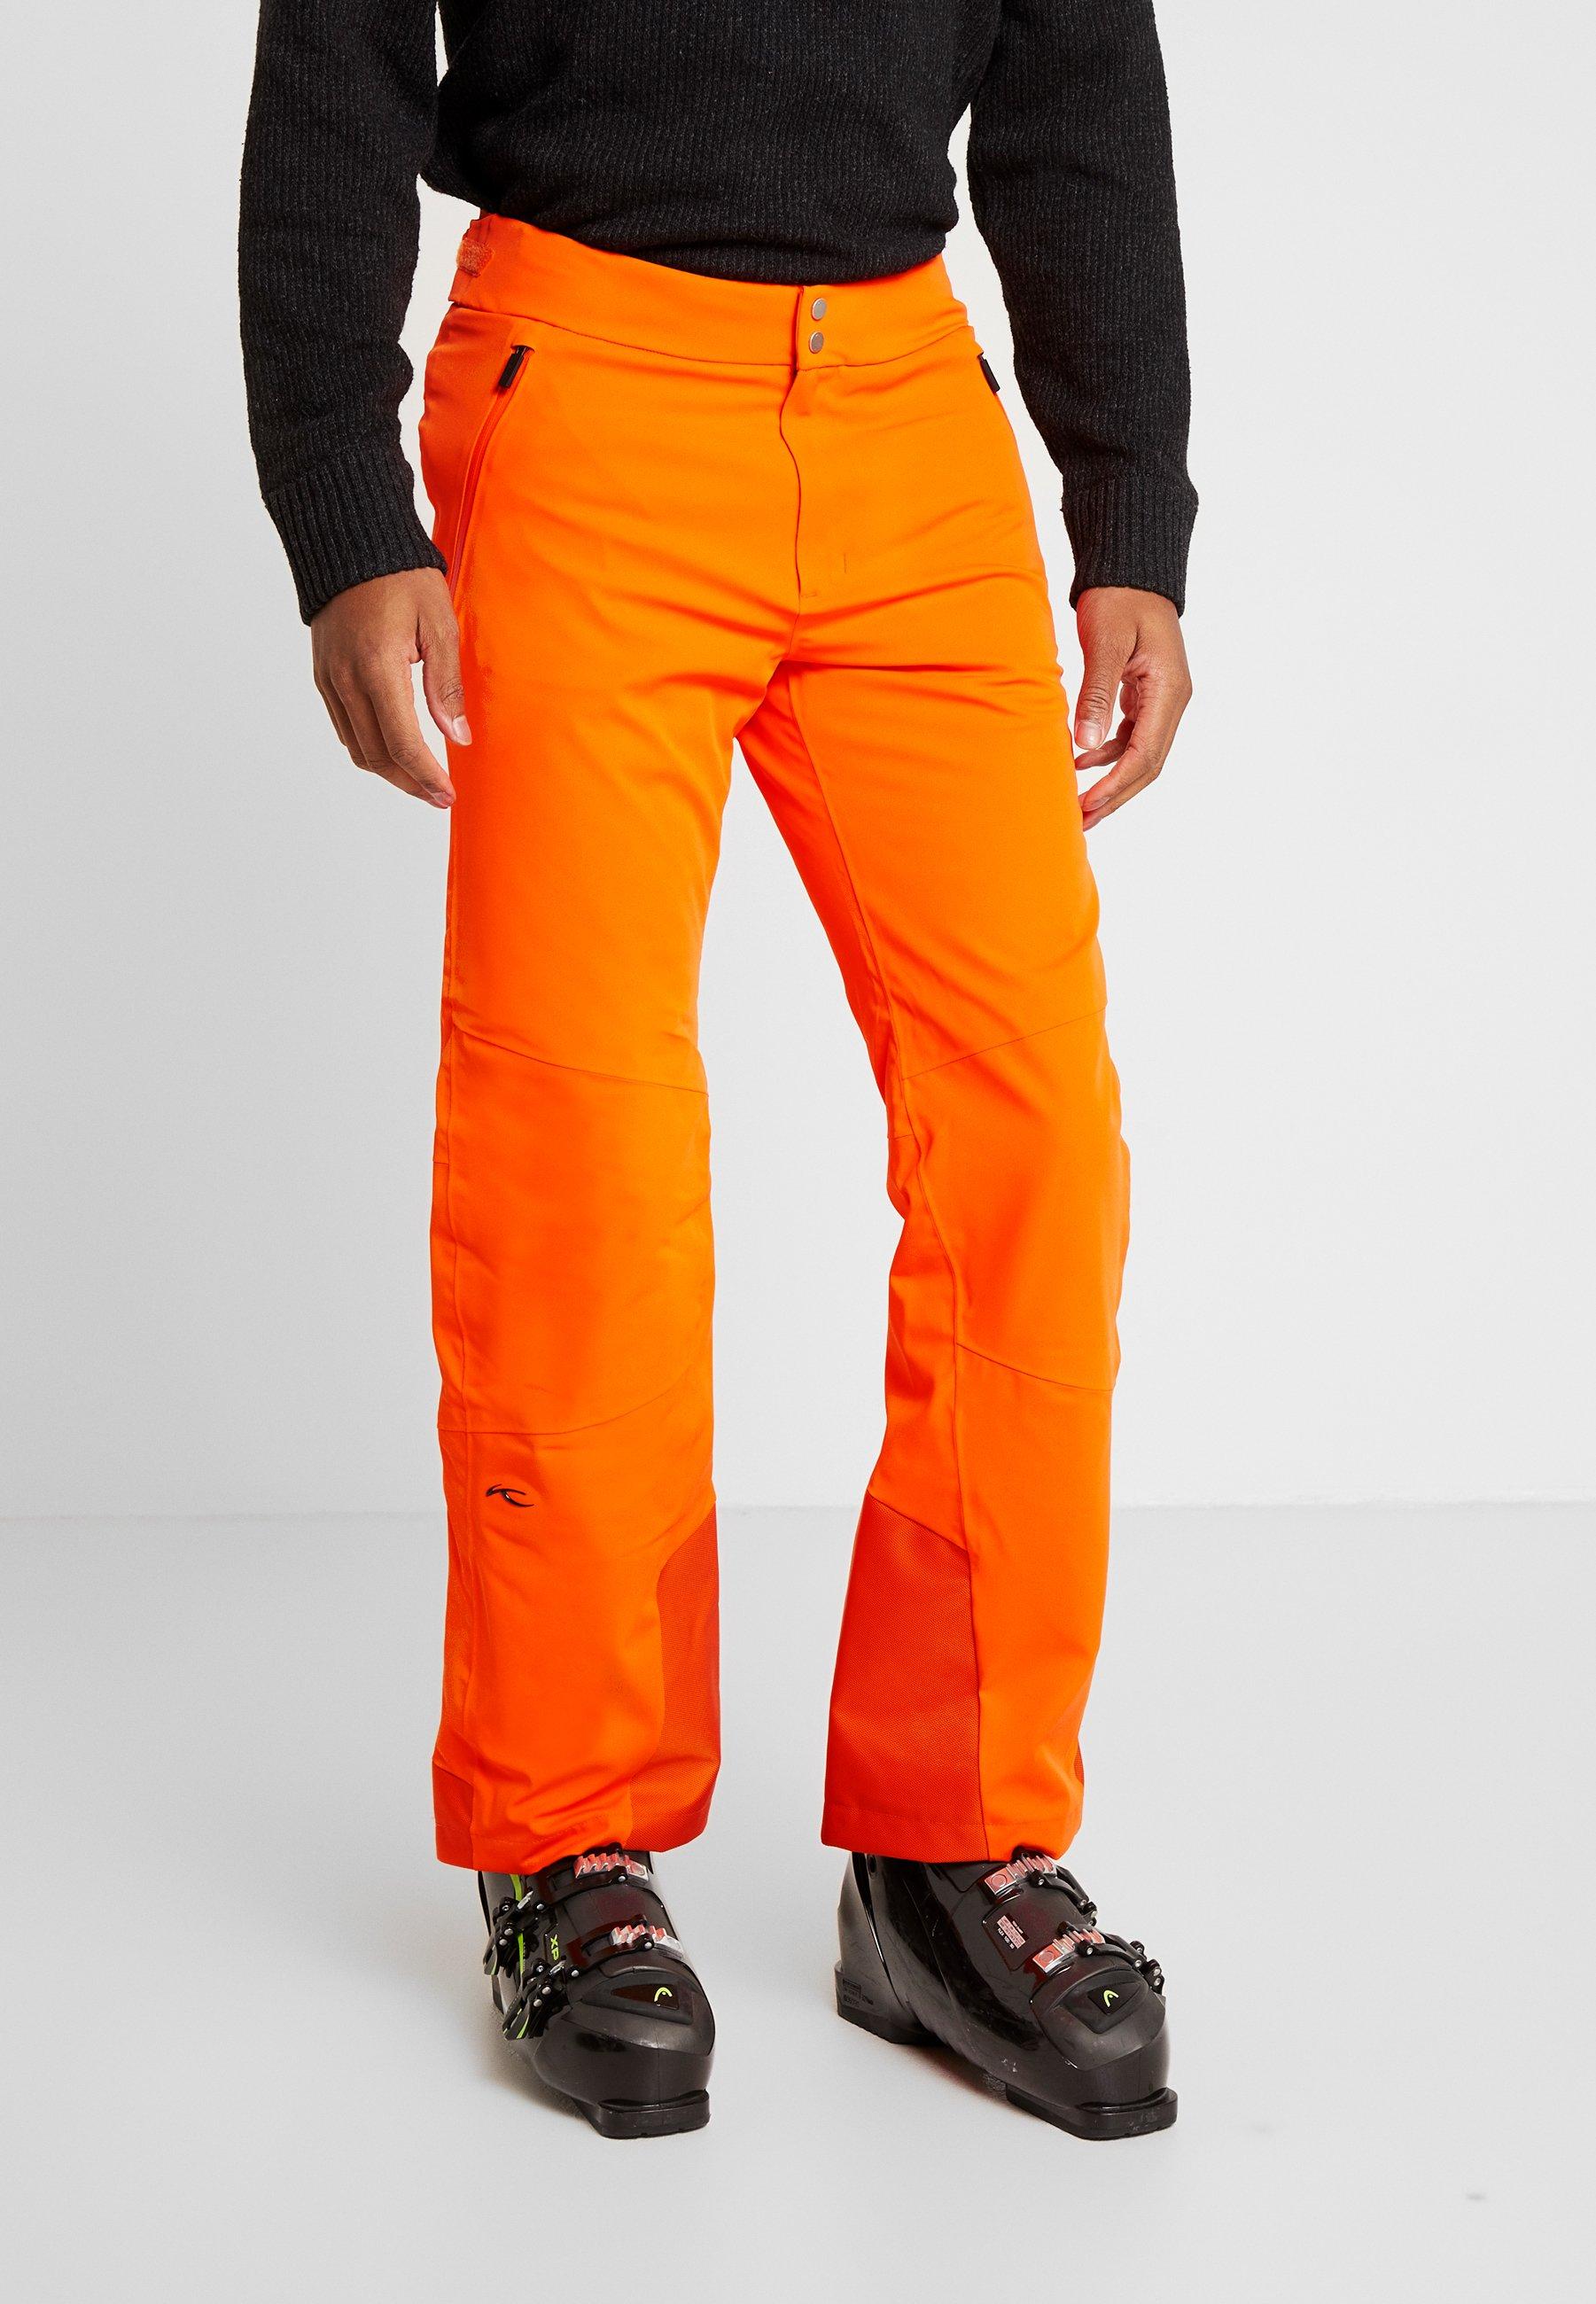 Kjus MEN FORMULA PANTS - Pantalon de ski orange